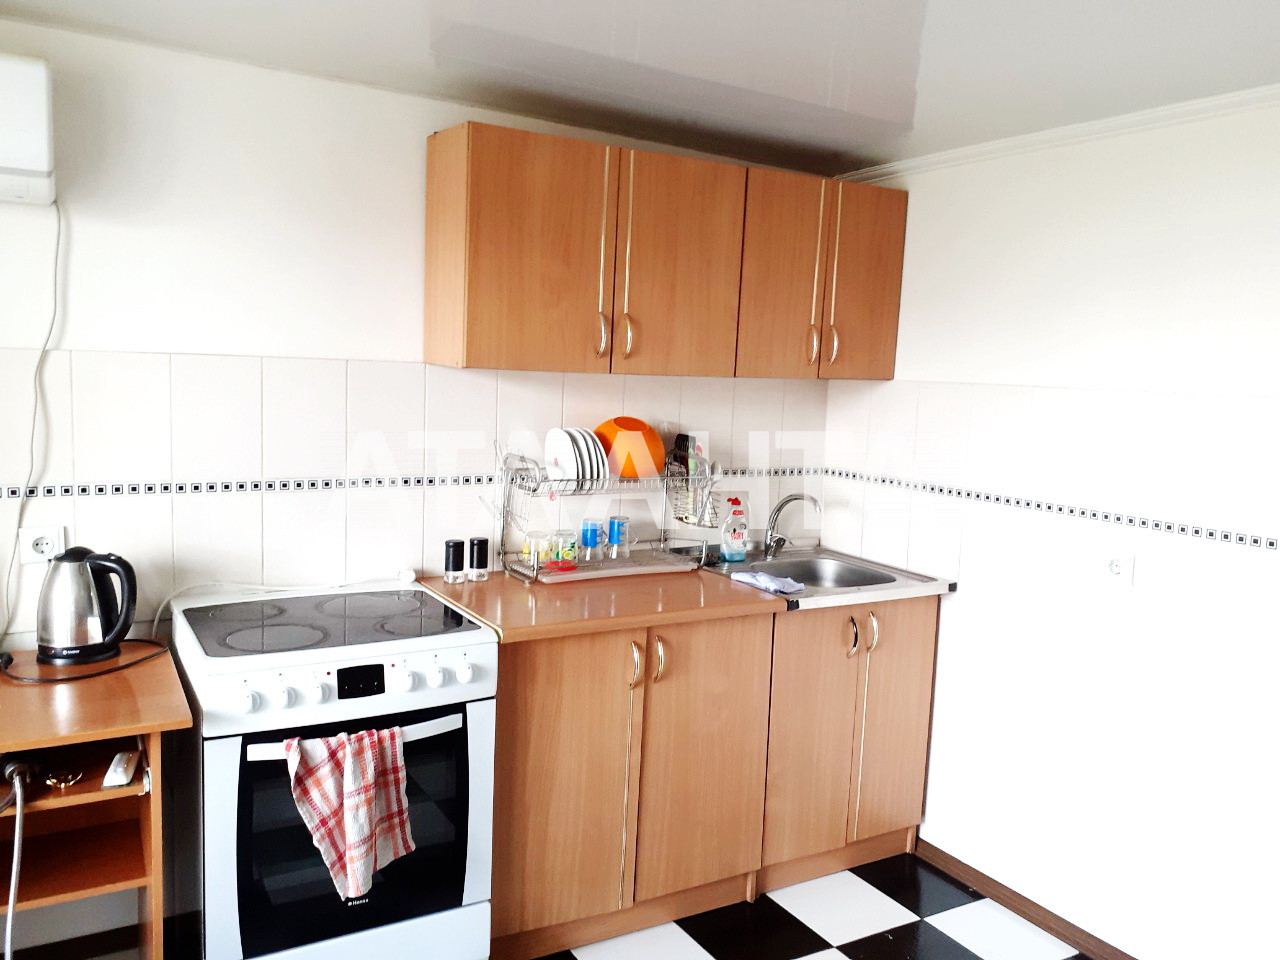 Продается 1-комнатная Квартира на ул. Ядова Сергея (Юбилейная) — 35 000 у.е. (фото №5)